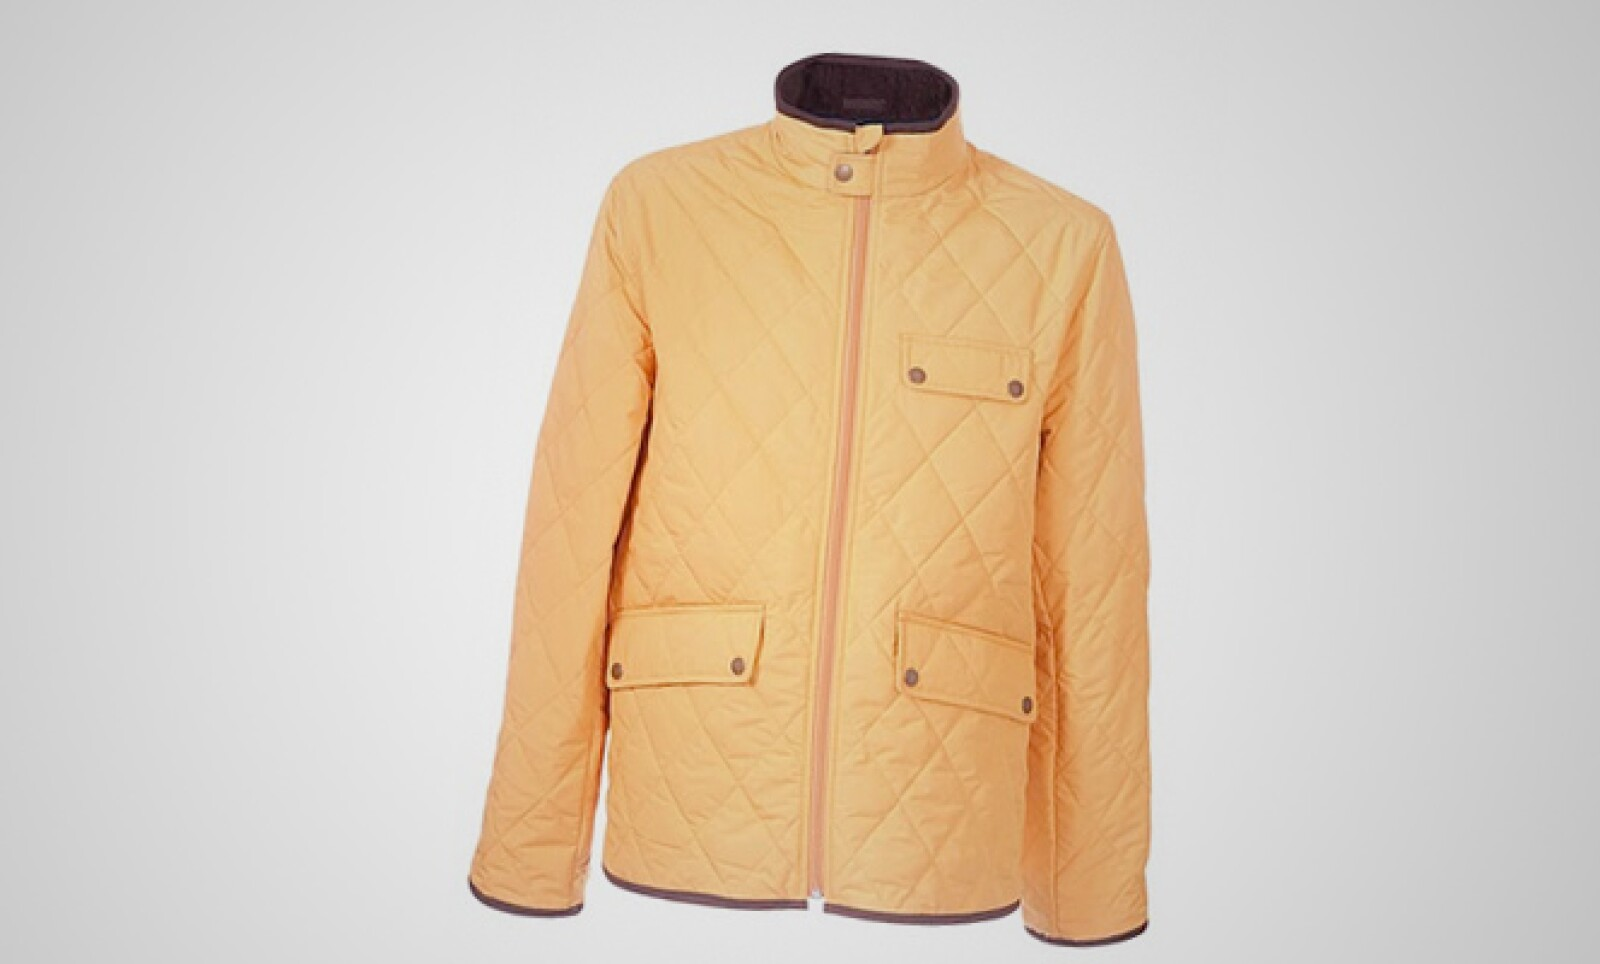 Atrévete con este color para protegerte de la lluvia vespertina.